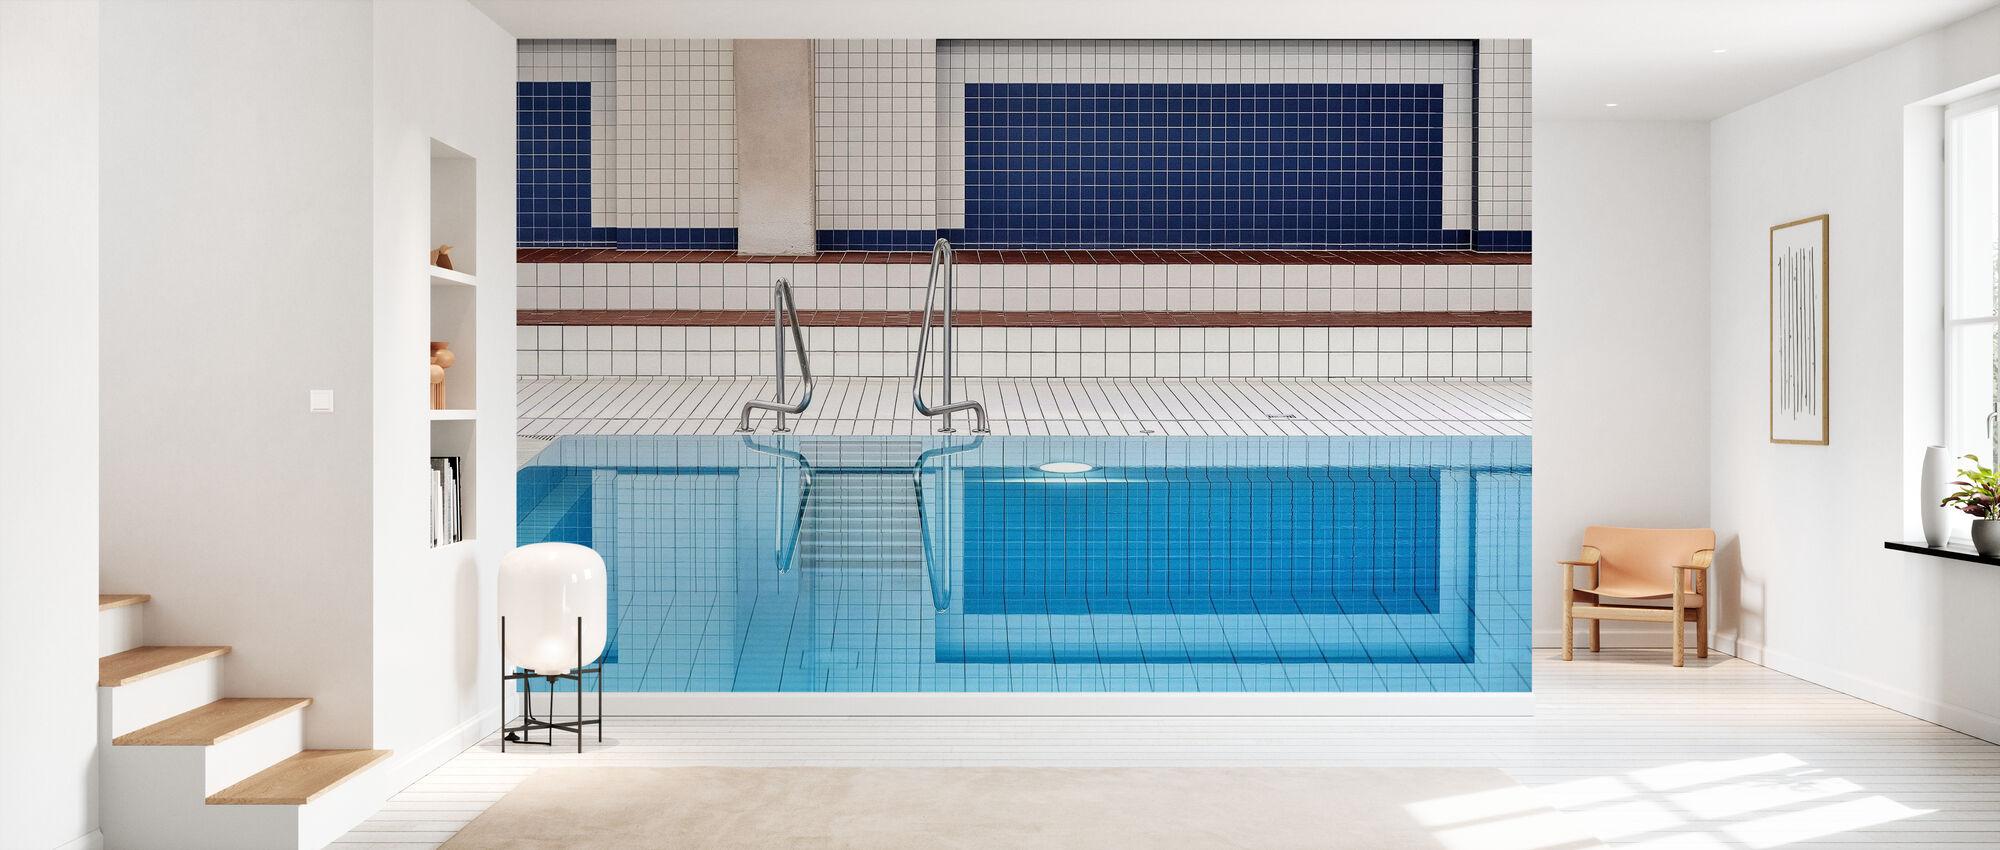 Swimming - Wallpaper - Hallway